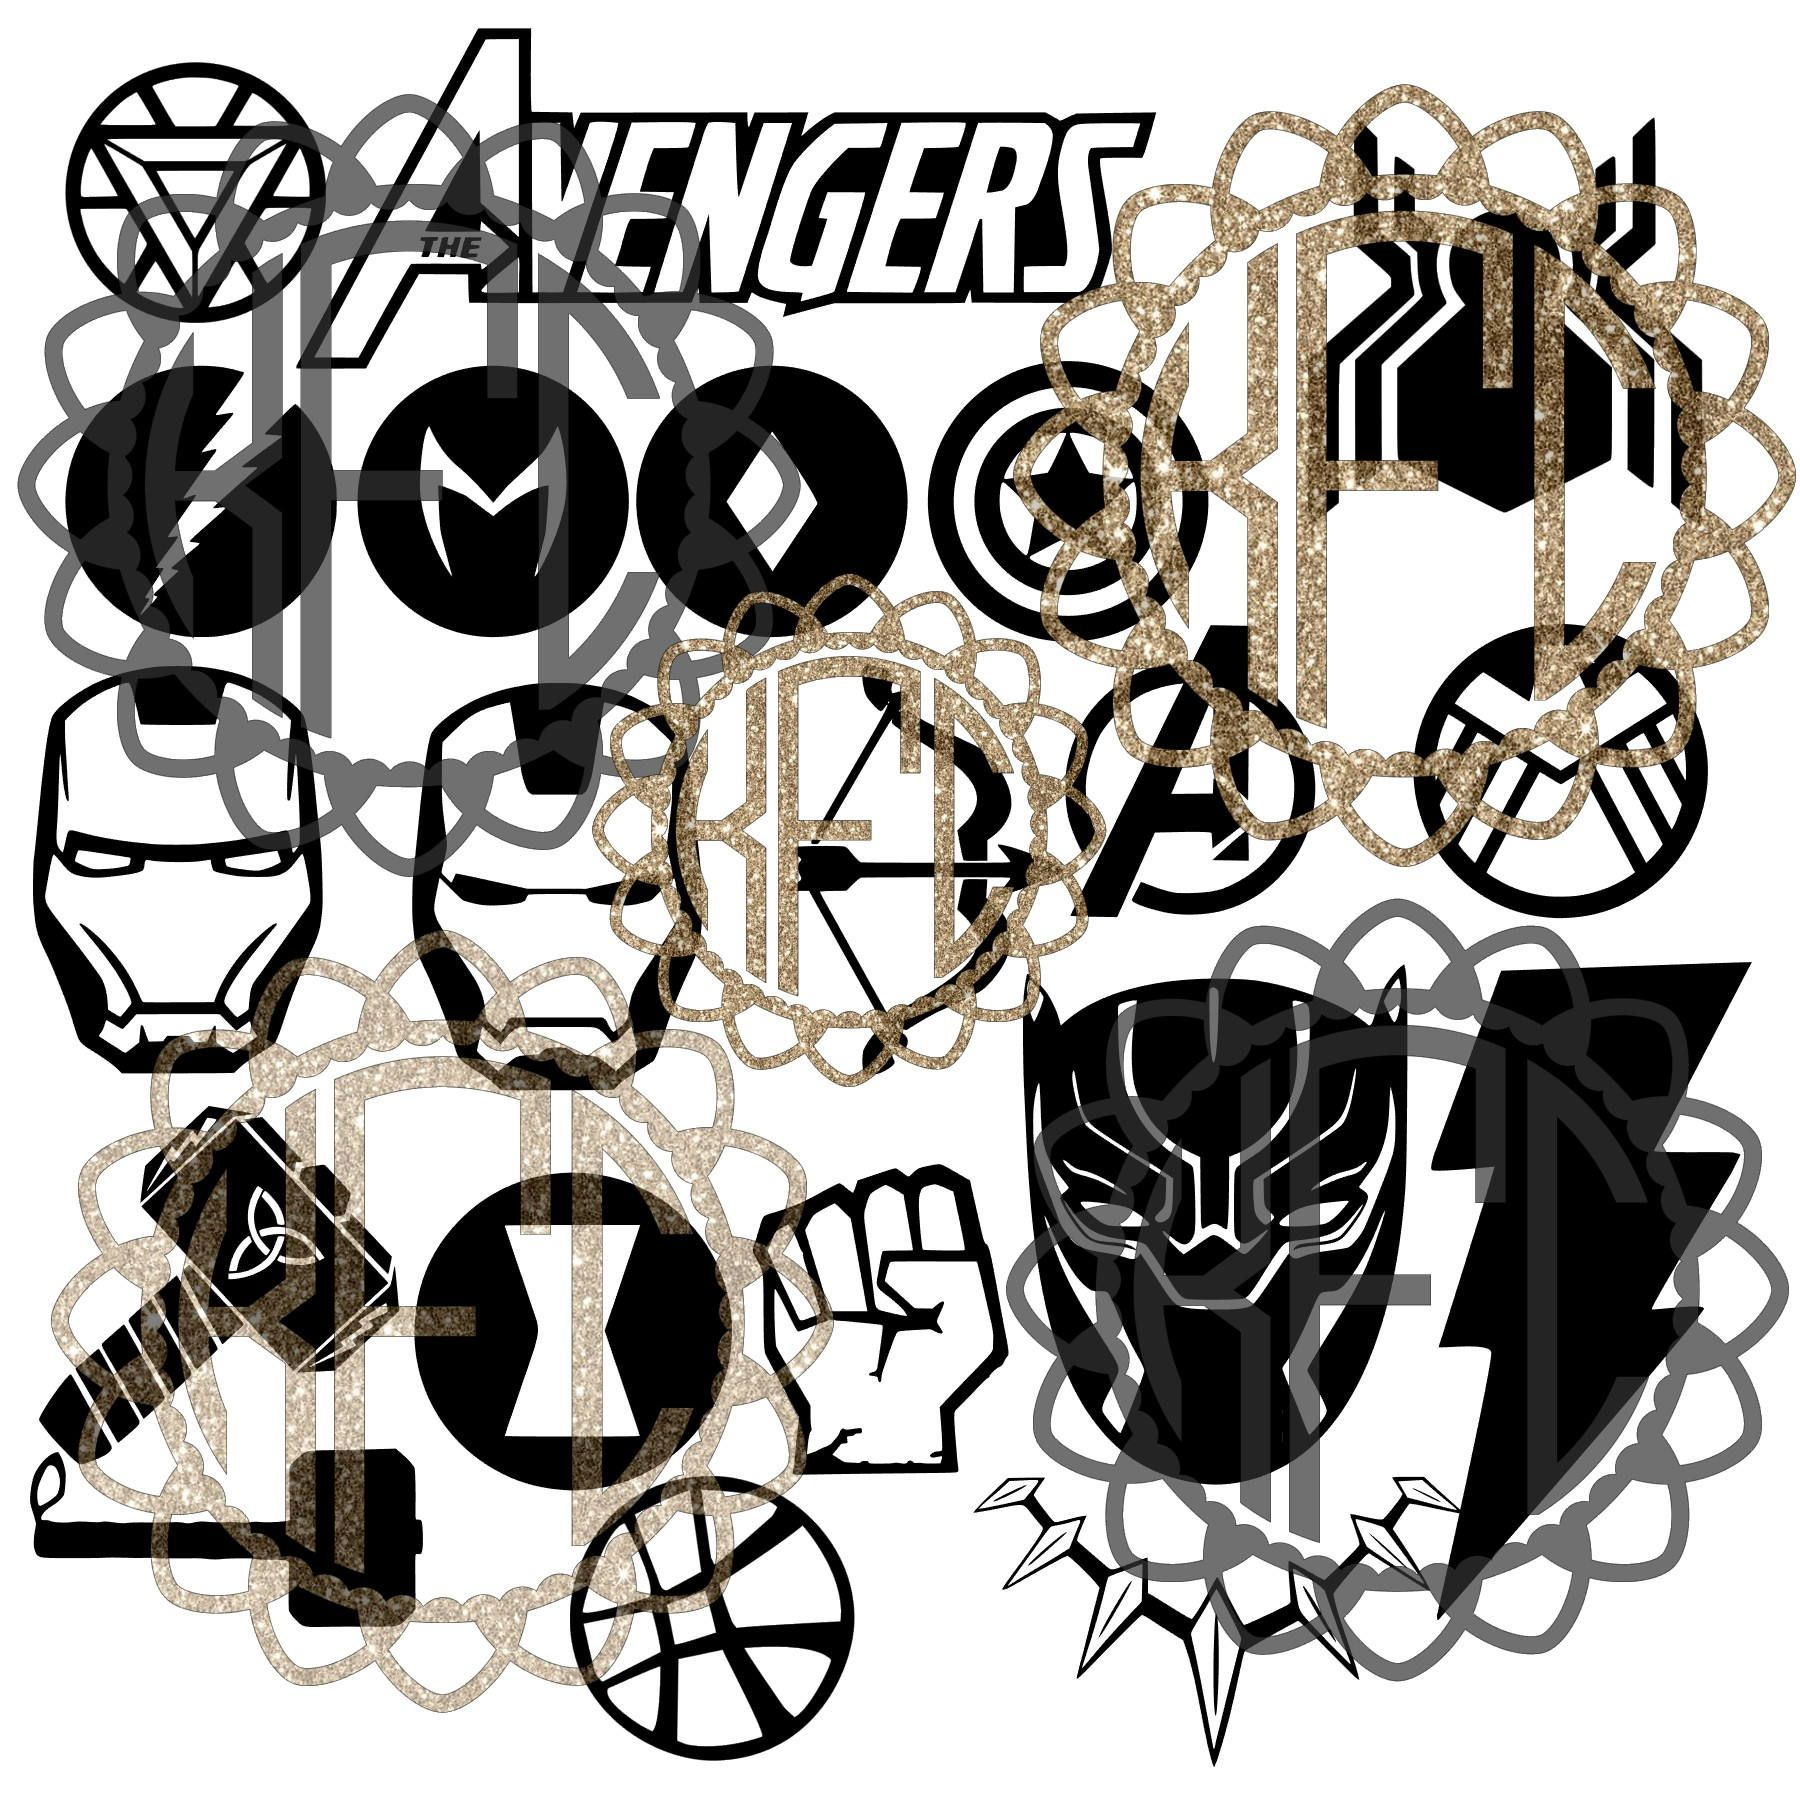 Avengers Black Panther Infinity War logo BUNDLE! Great